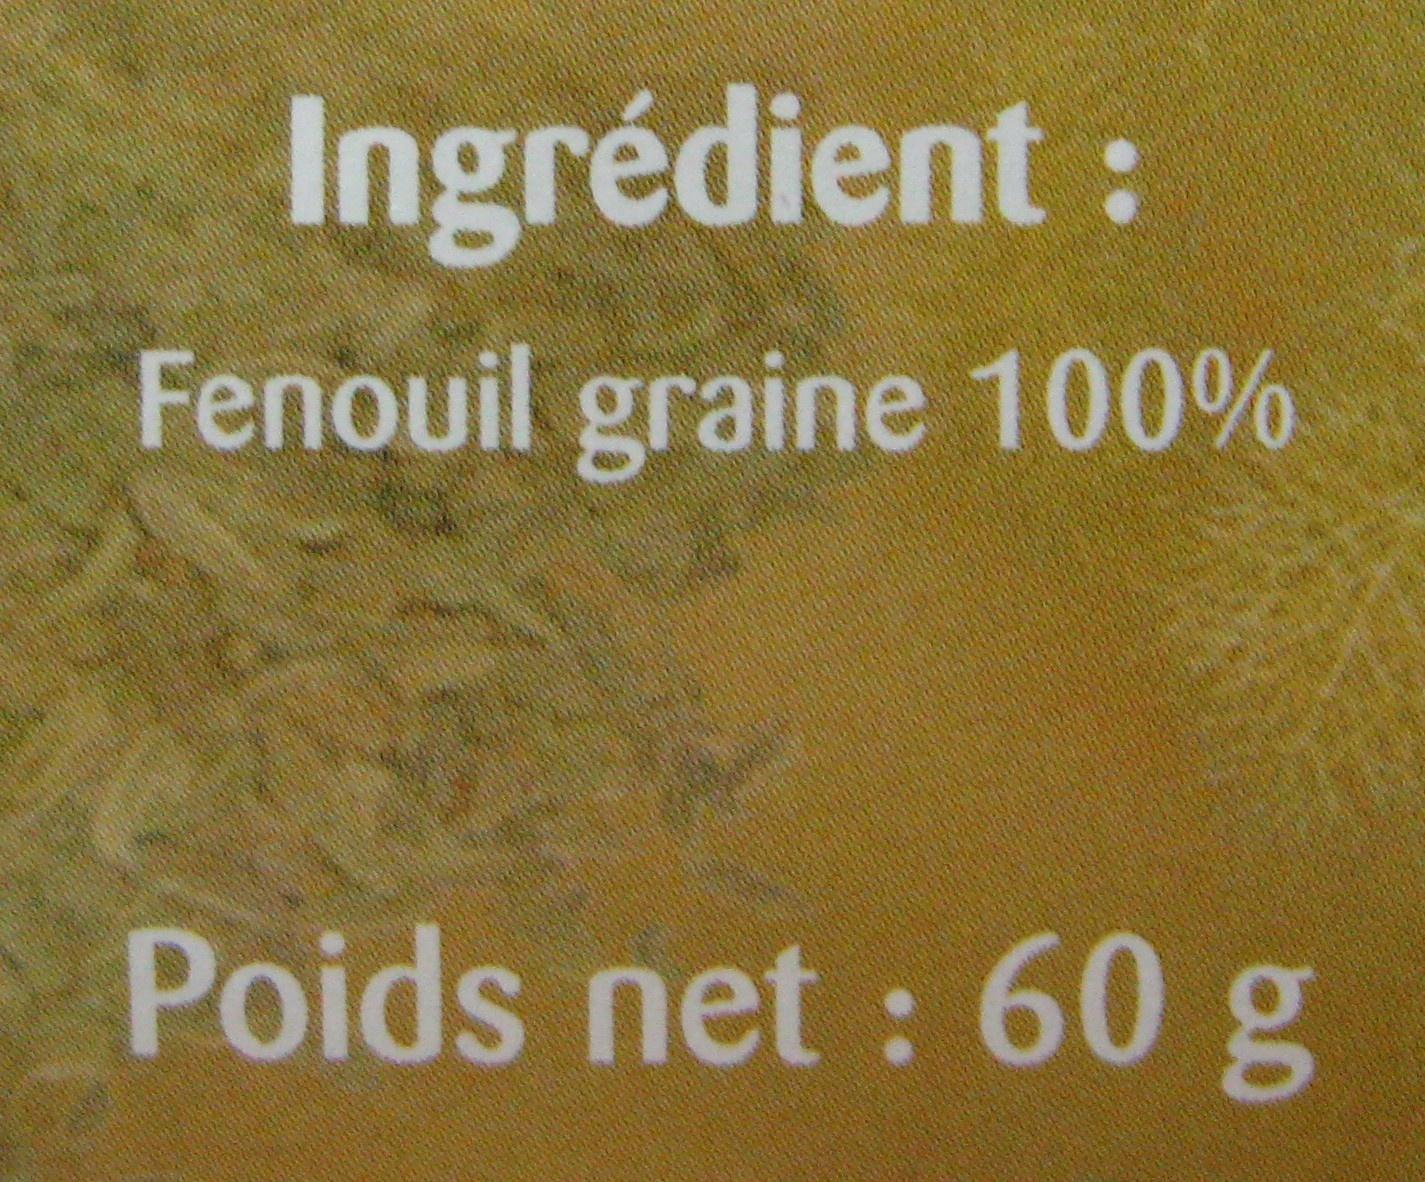 FENOUIL - Ingredienti - fr